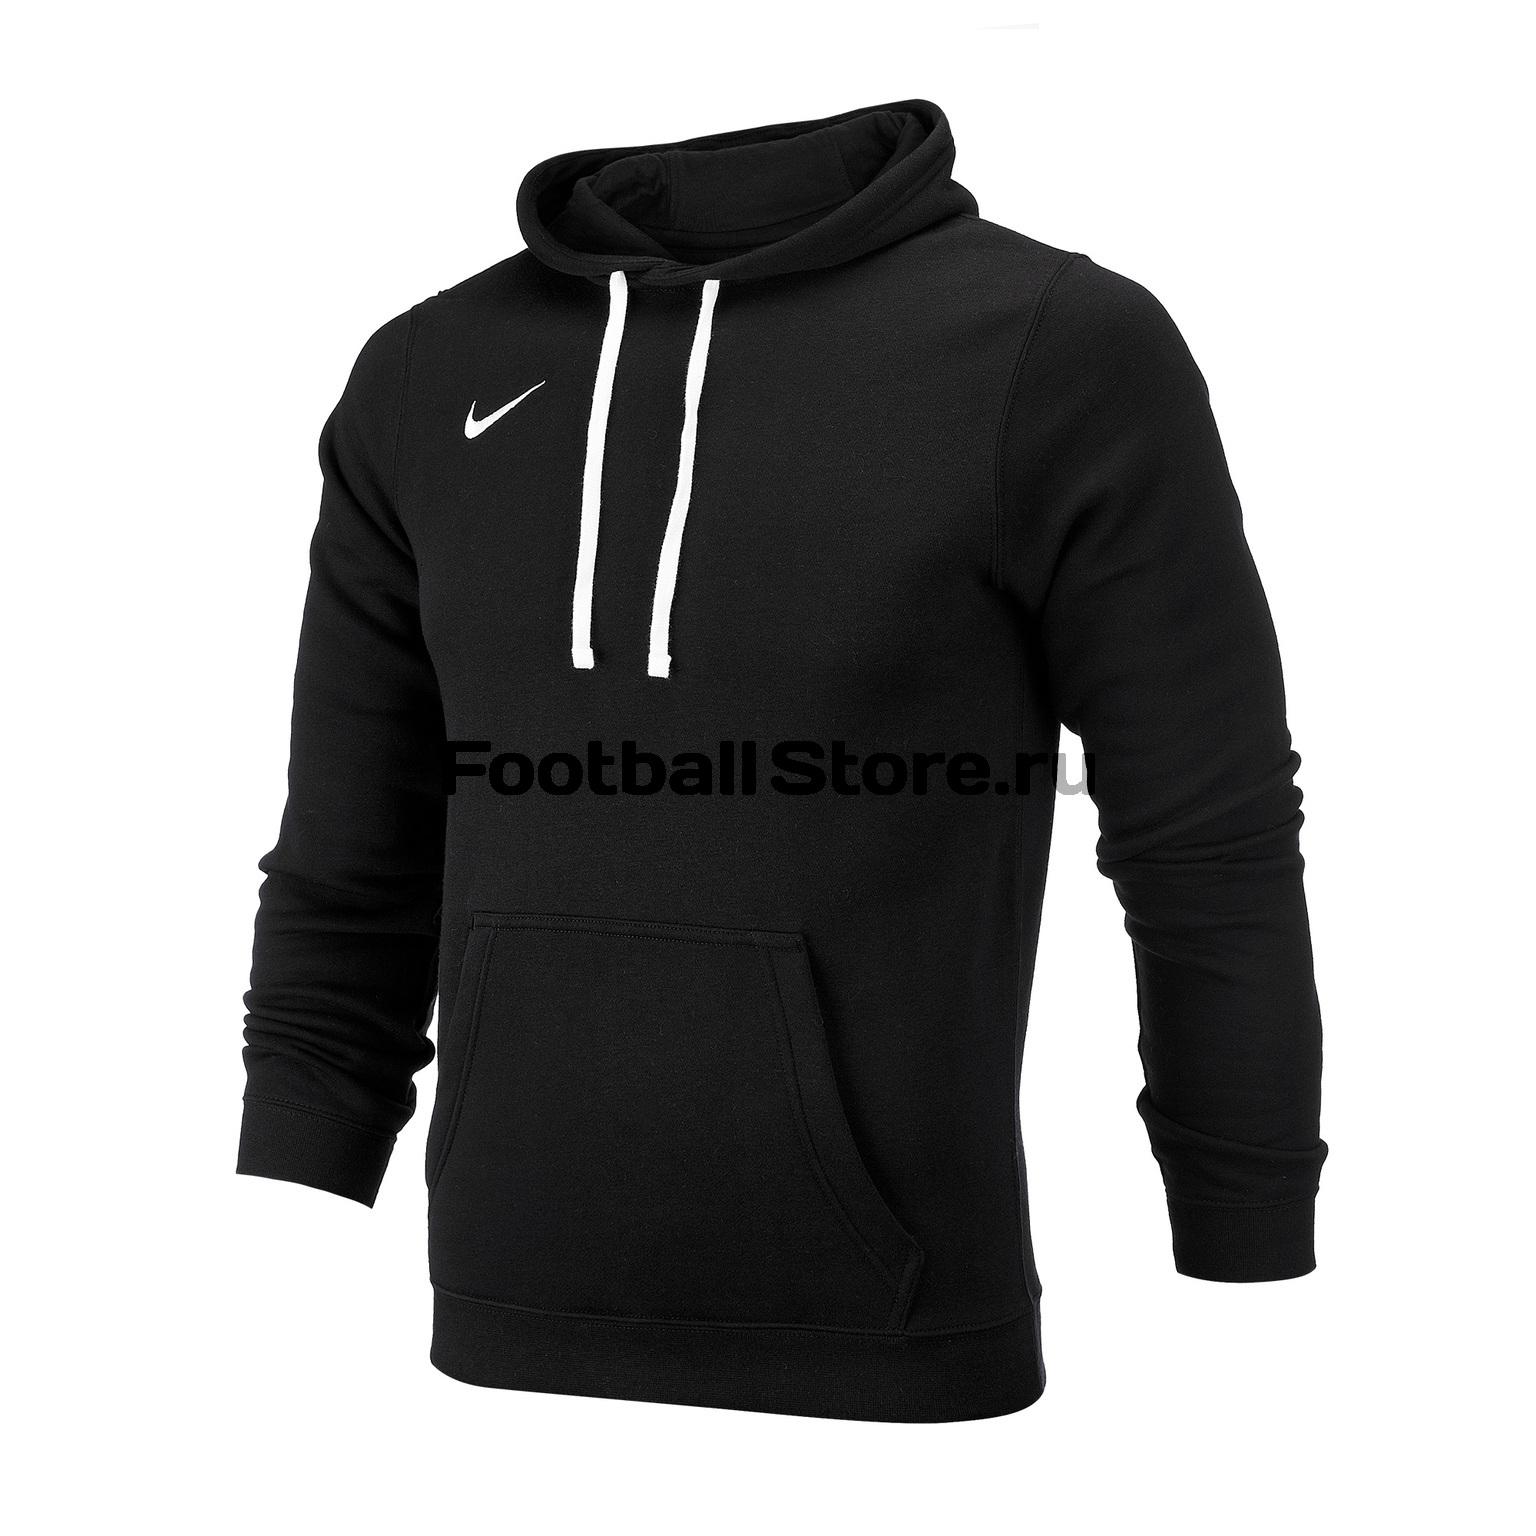 Толстовка Nike Hoodie Po Flc Club19 AR3239-010 толстовка nike sportswear hoodie 928719 010